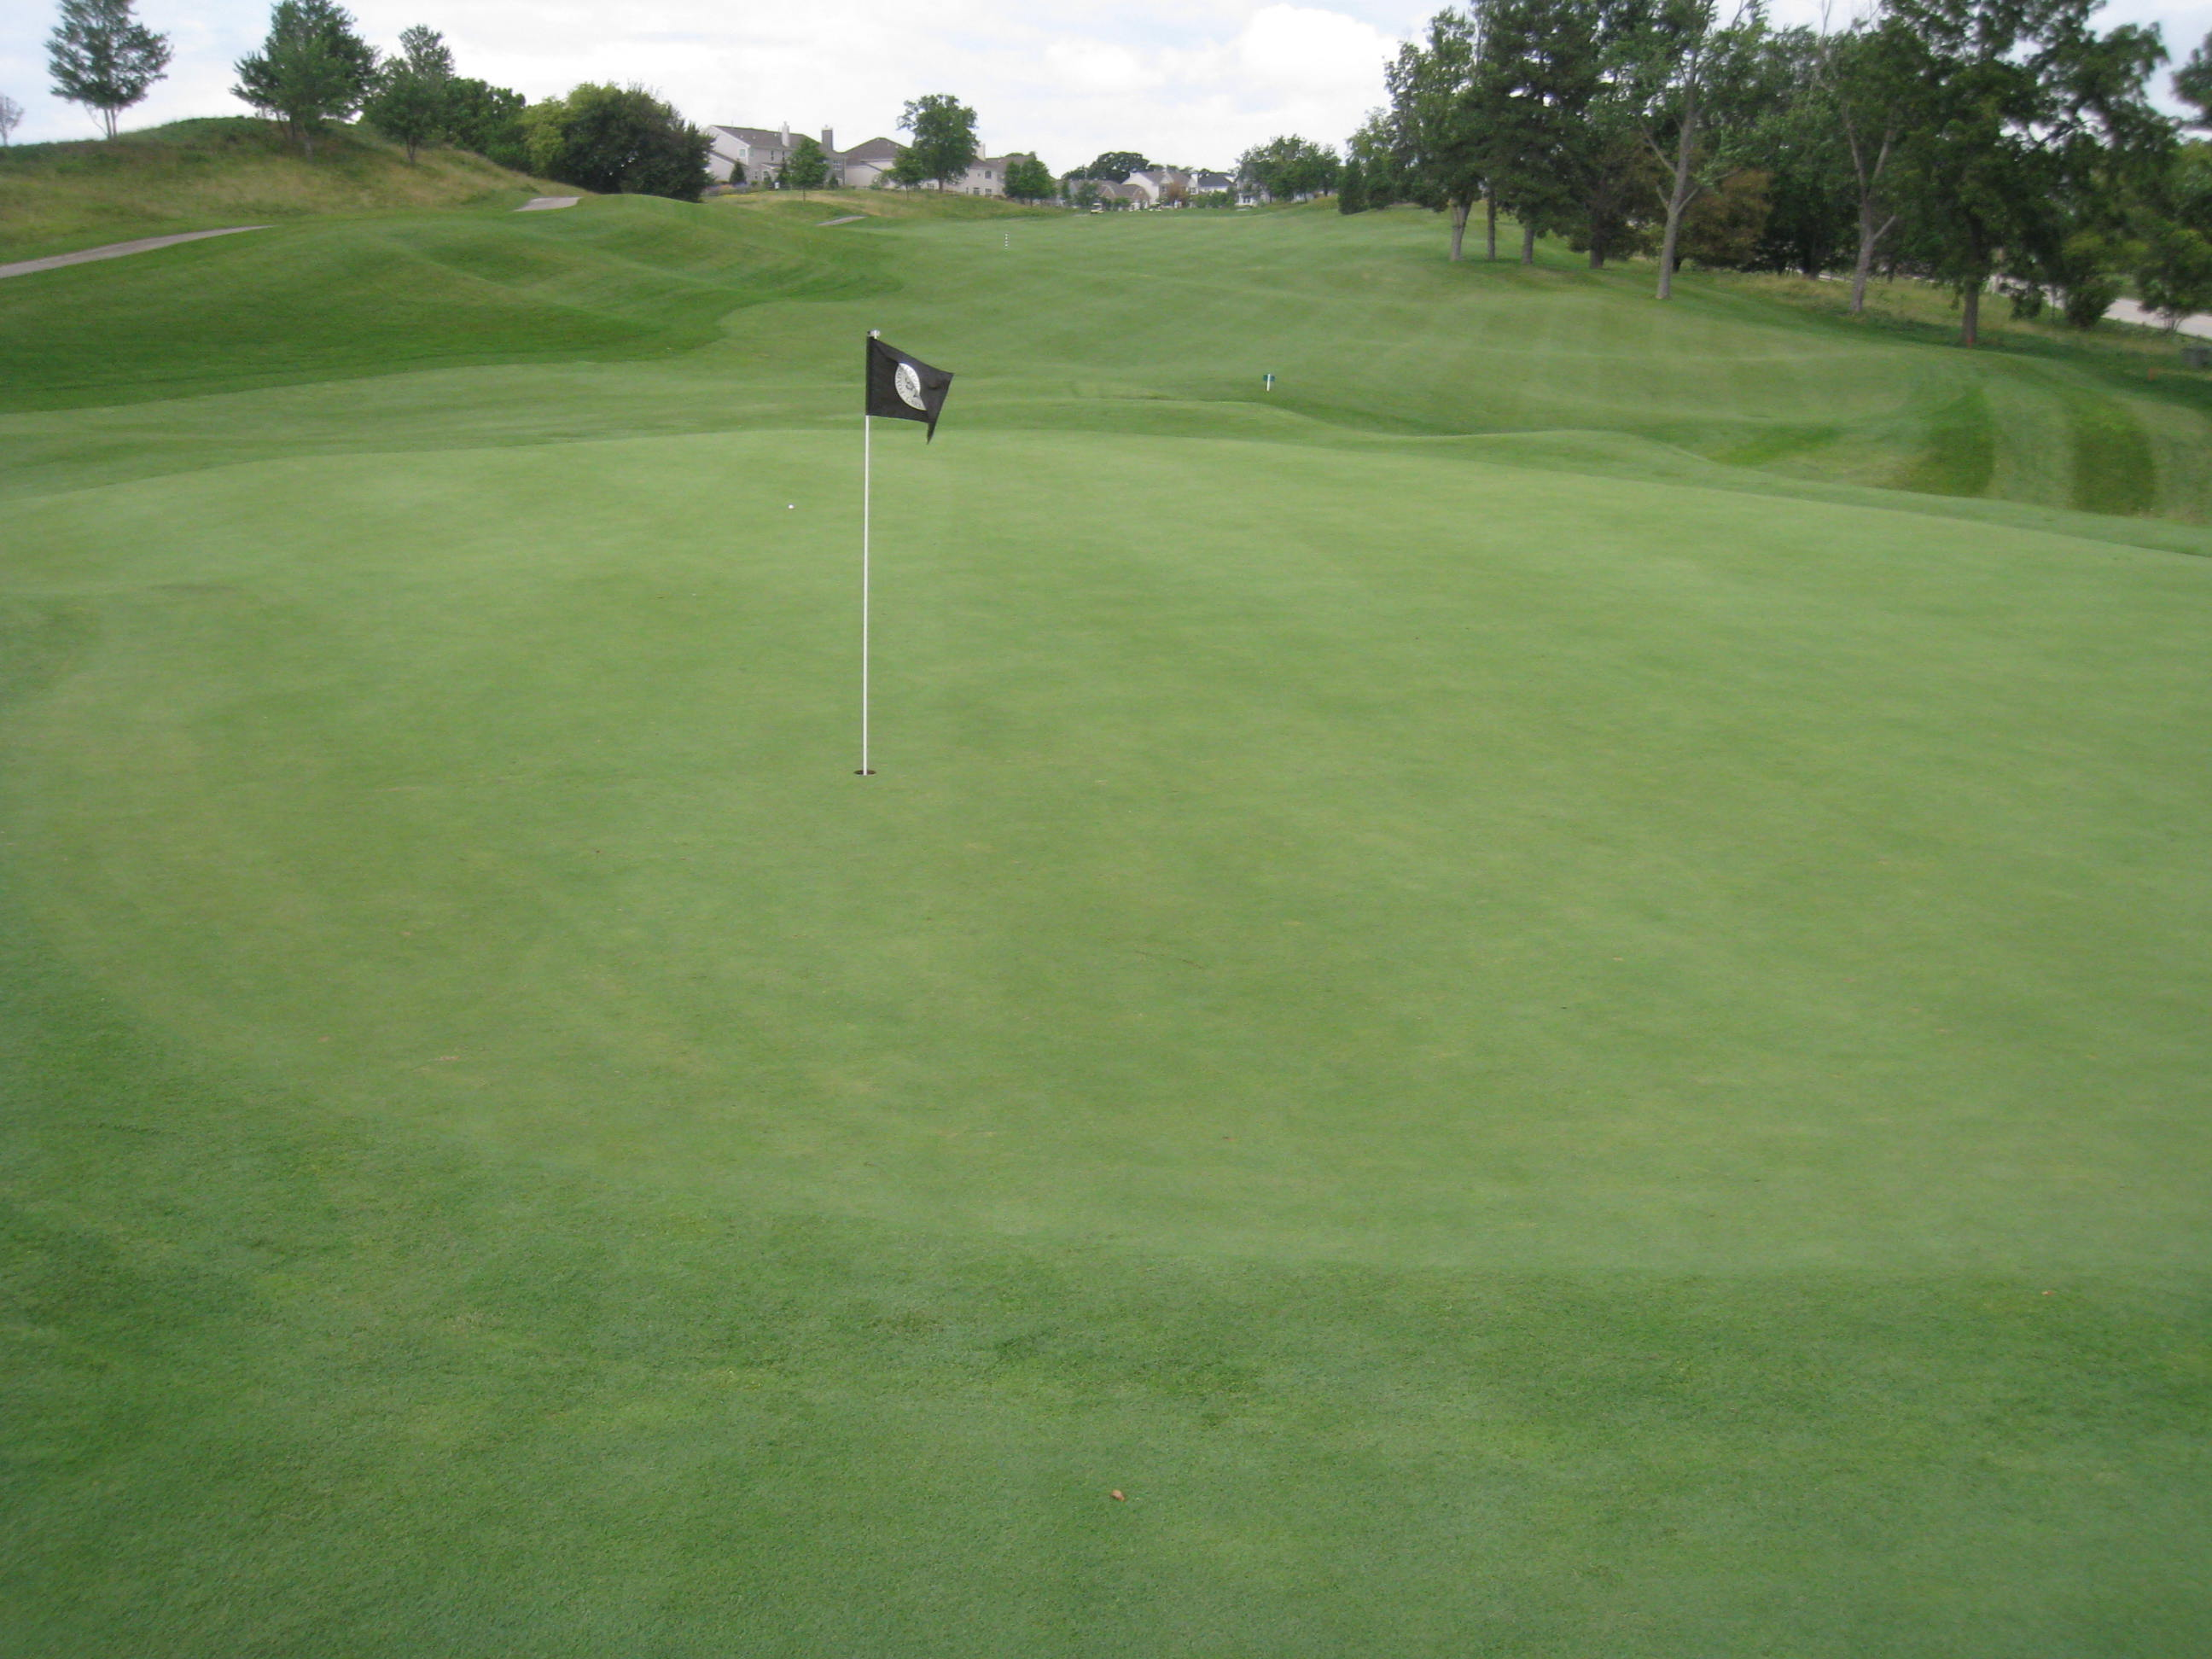 Green Golf file:green (golf) - wikimedia commons